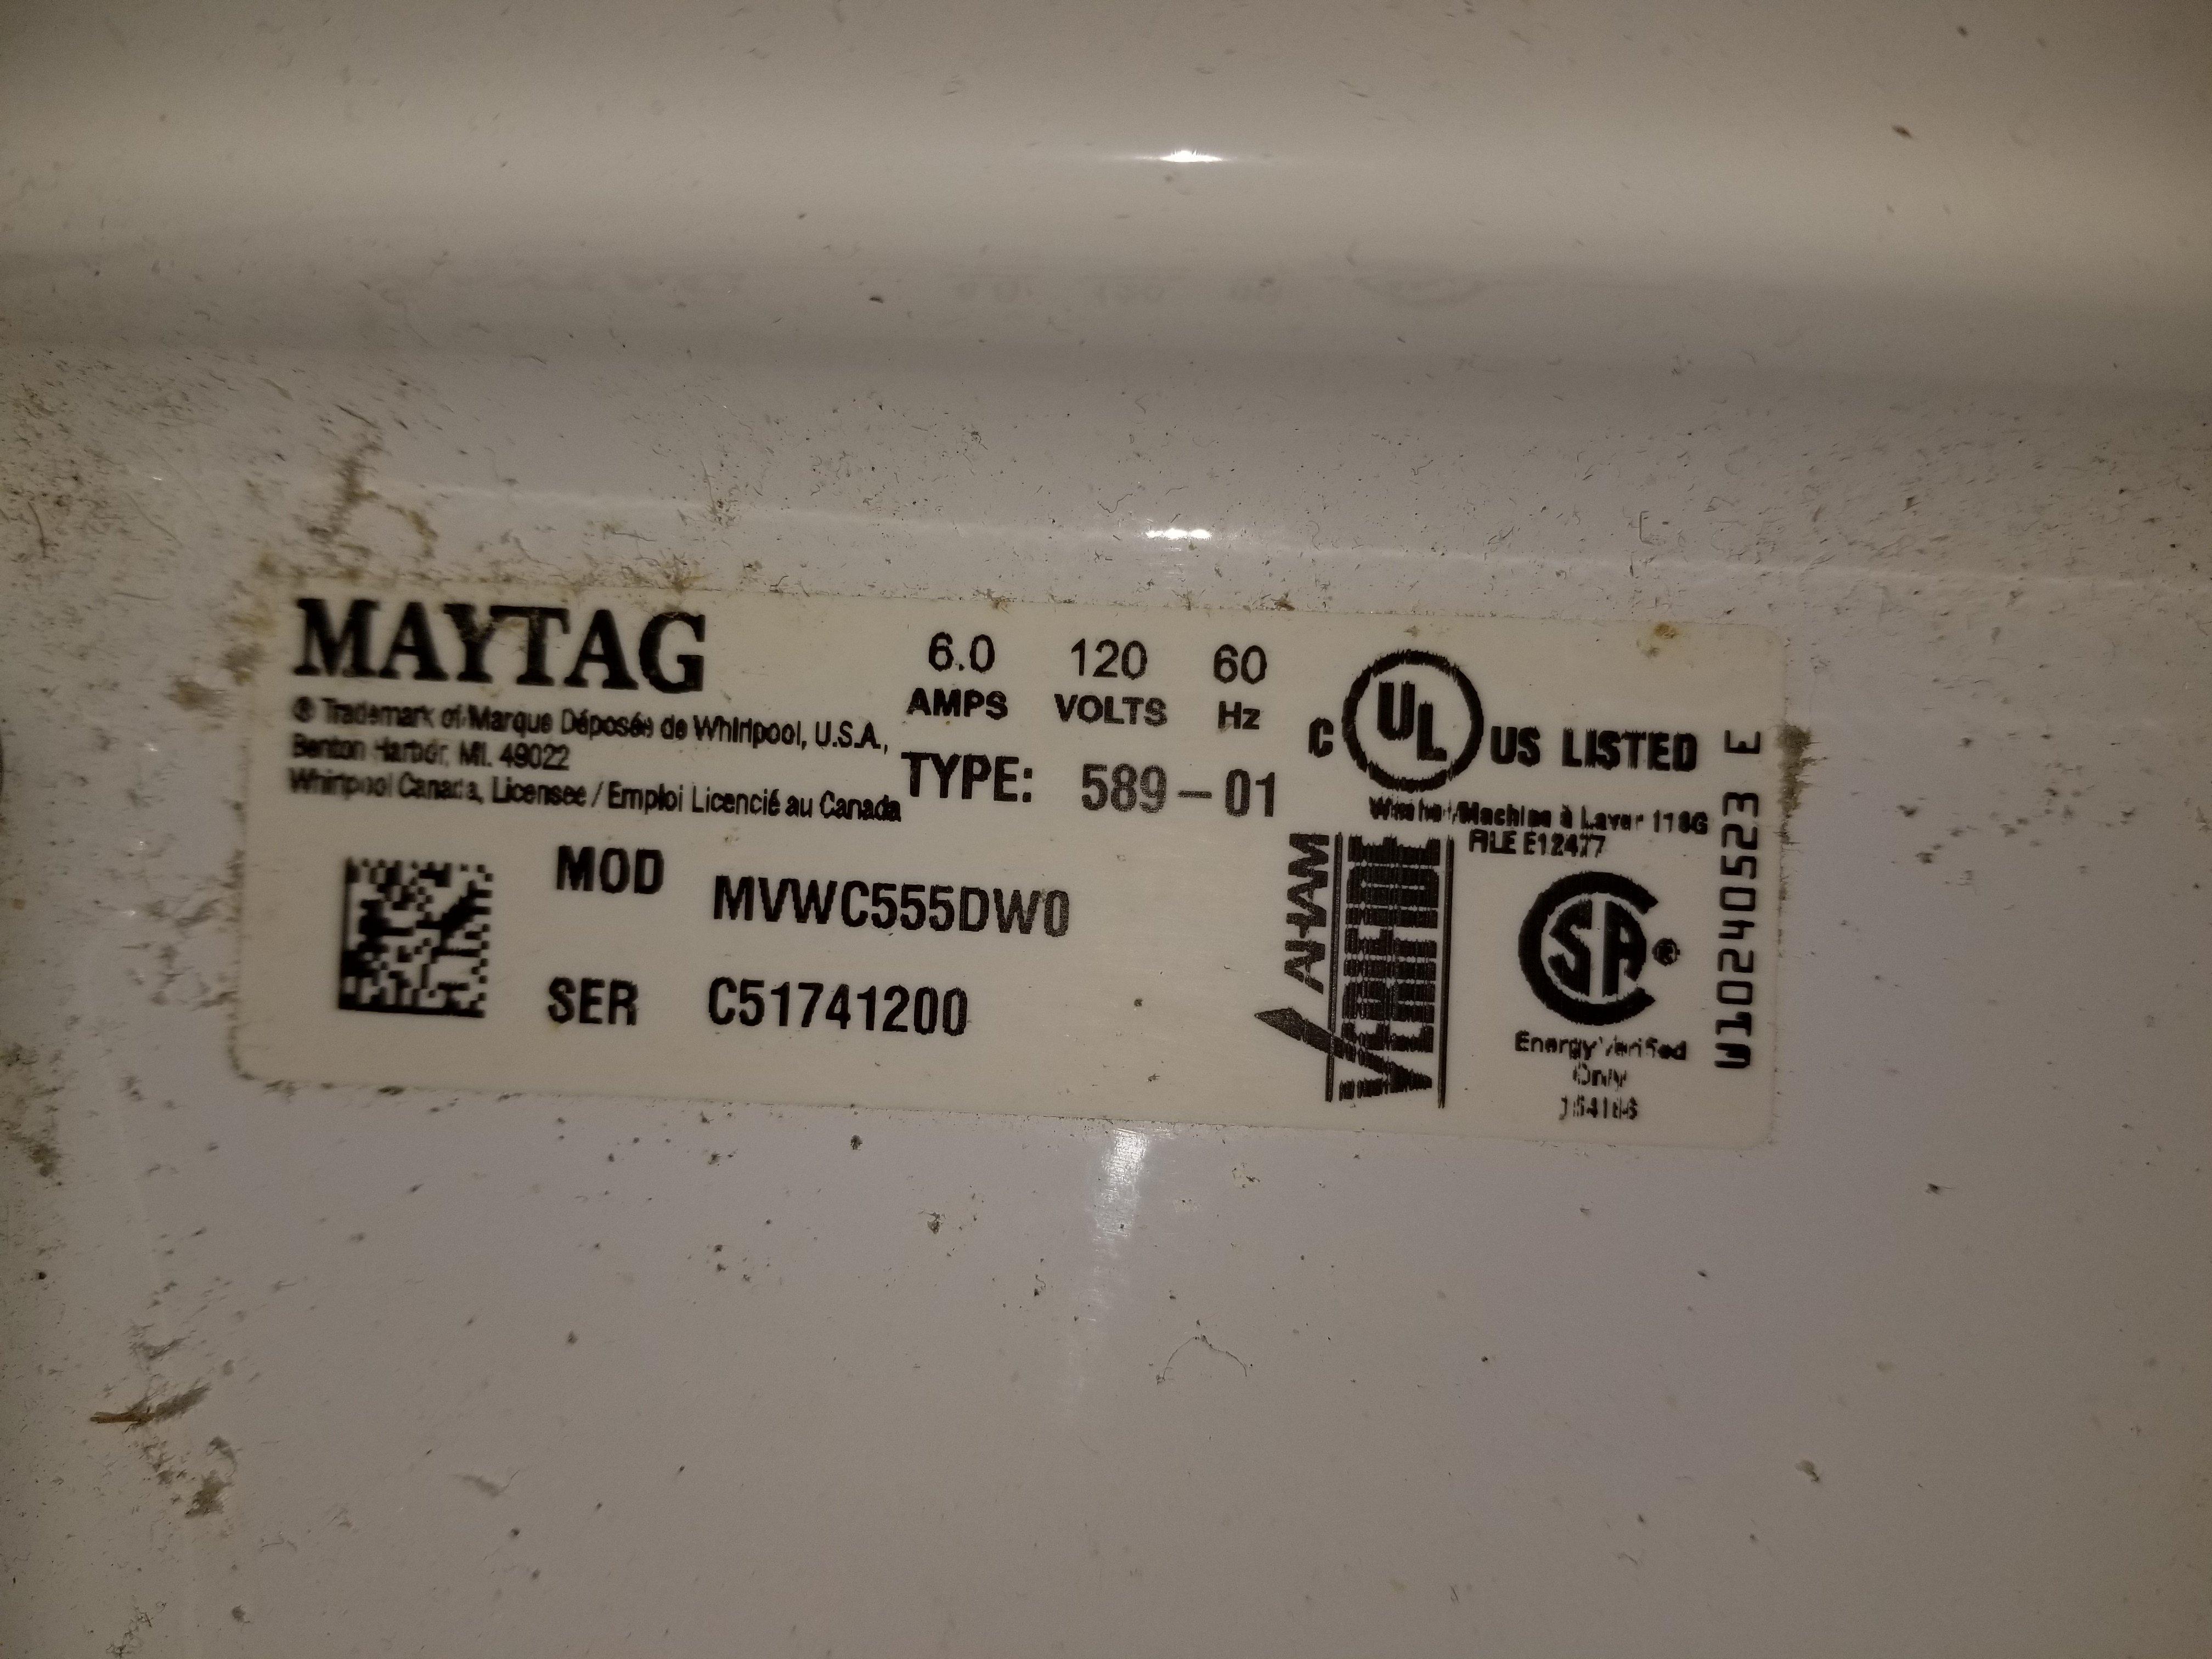 Maytag Washer Mvwb700vqo Wiring Diagram Diagrams Site For A